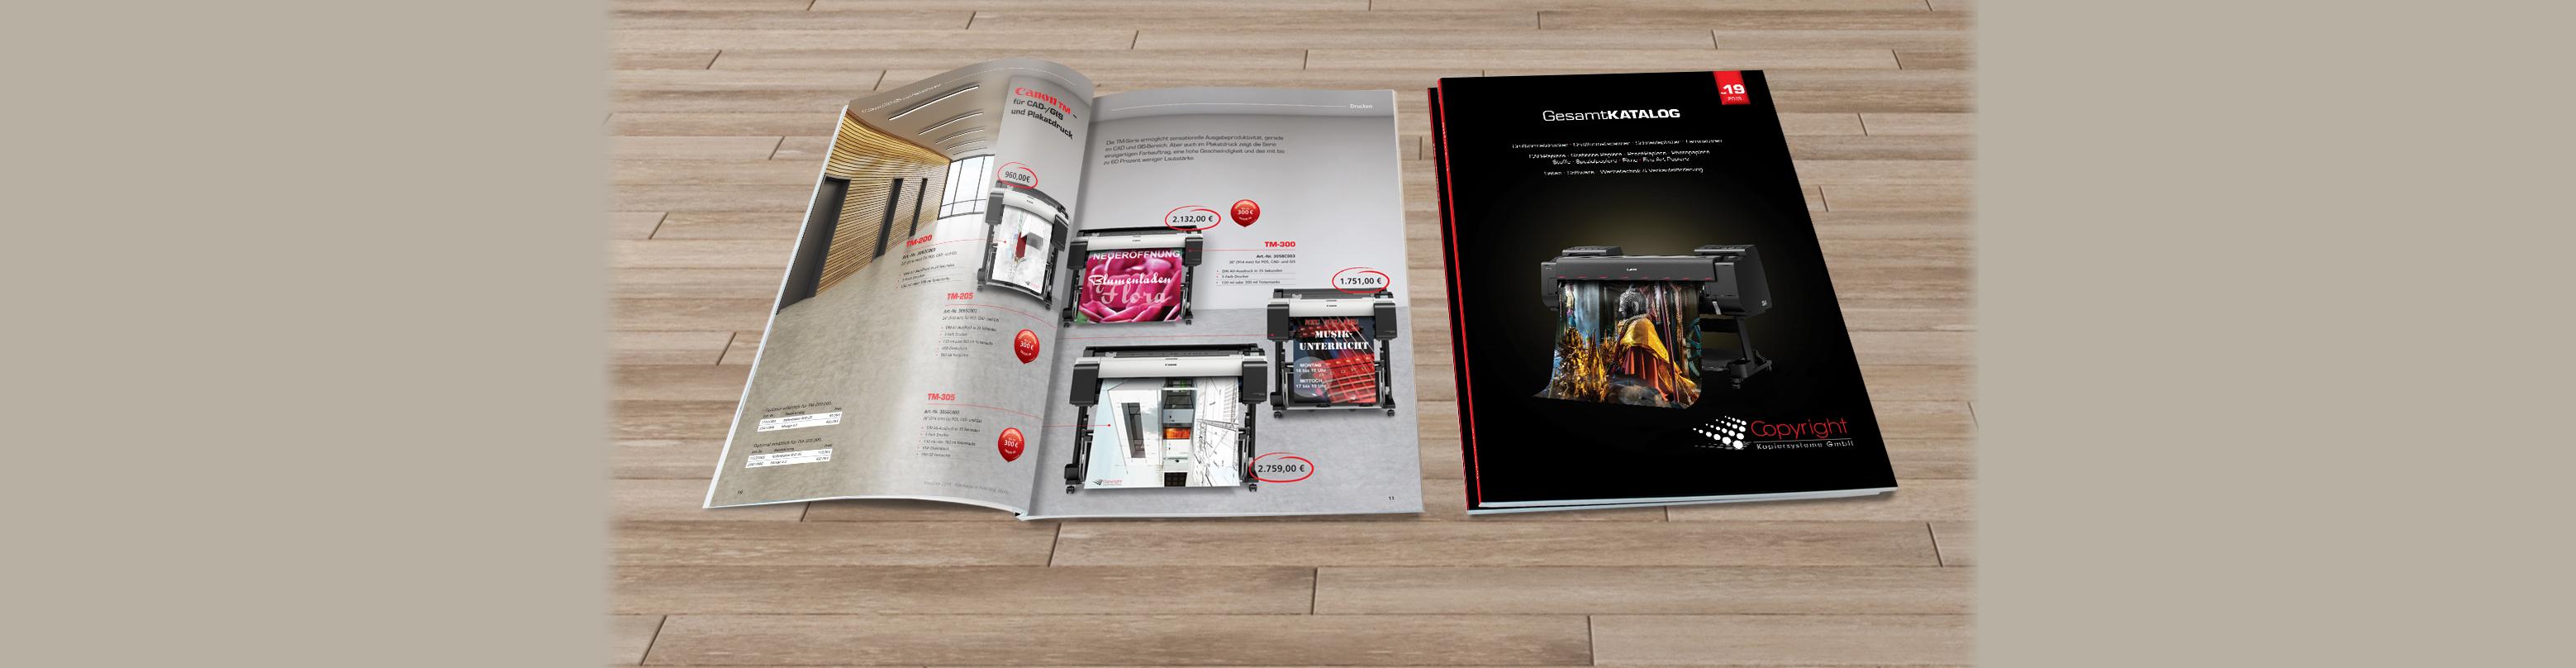 Copyright Kopiersysteme Katalog 2019